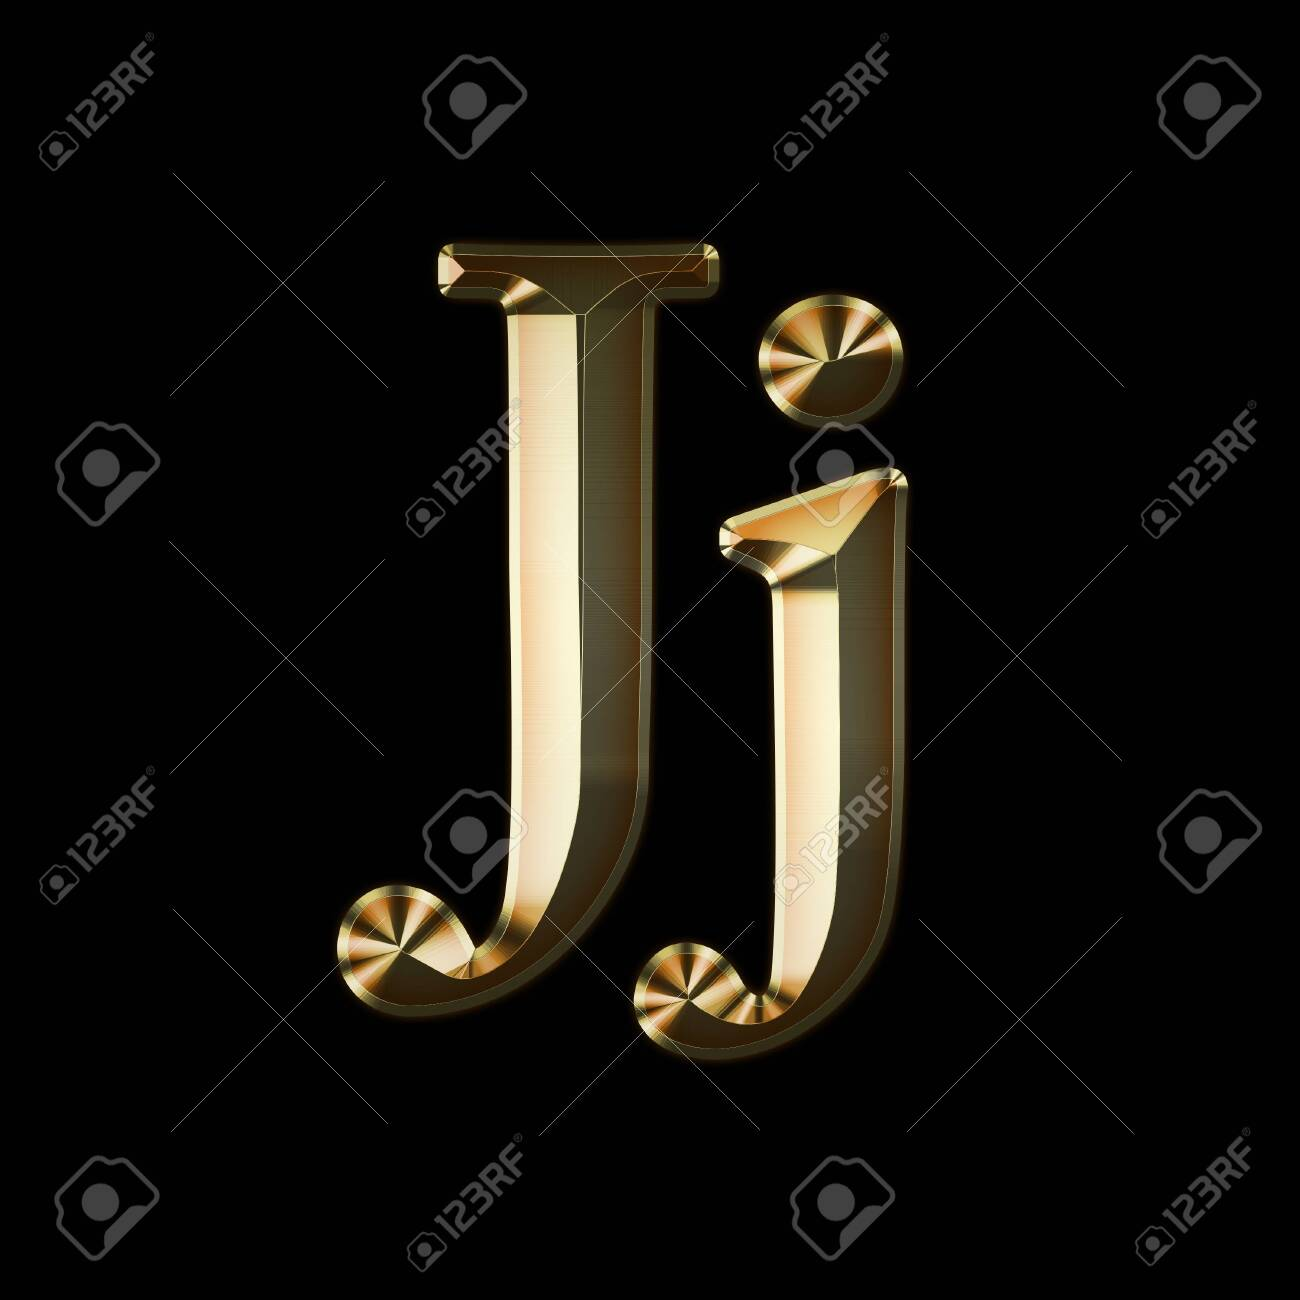 Luxury Jj 2-level Gold Gradient Isolated on Black, Gold Glittering Metal Latin Alphabet, Elegant Realistic 3D Dd Golden Glitter Letters, ABC Font - 142769852